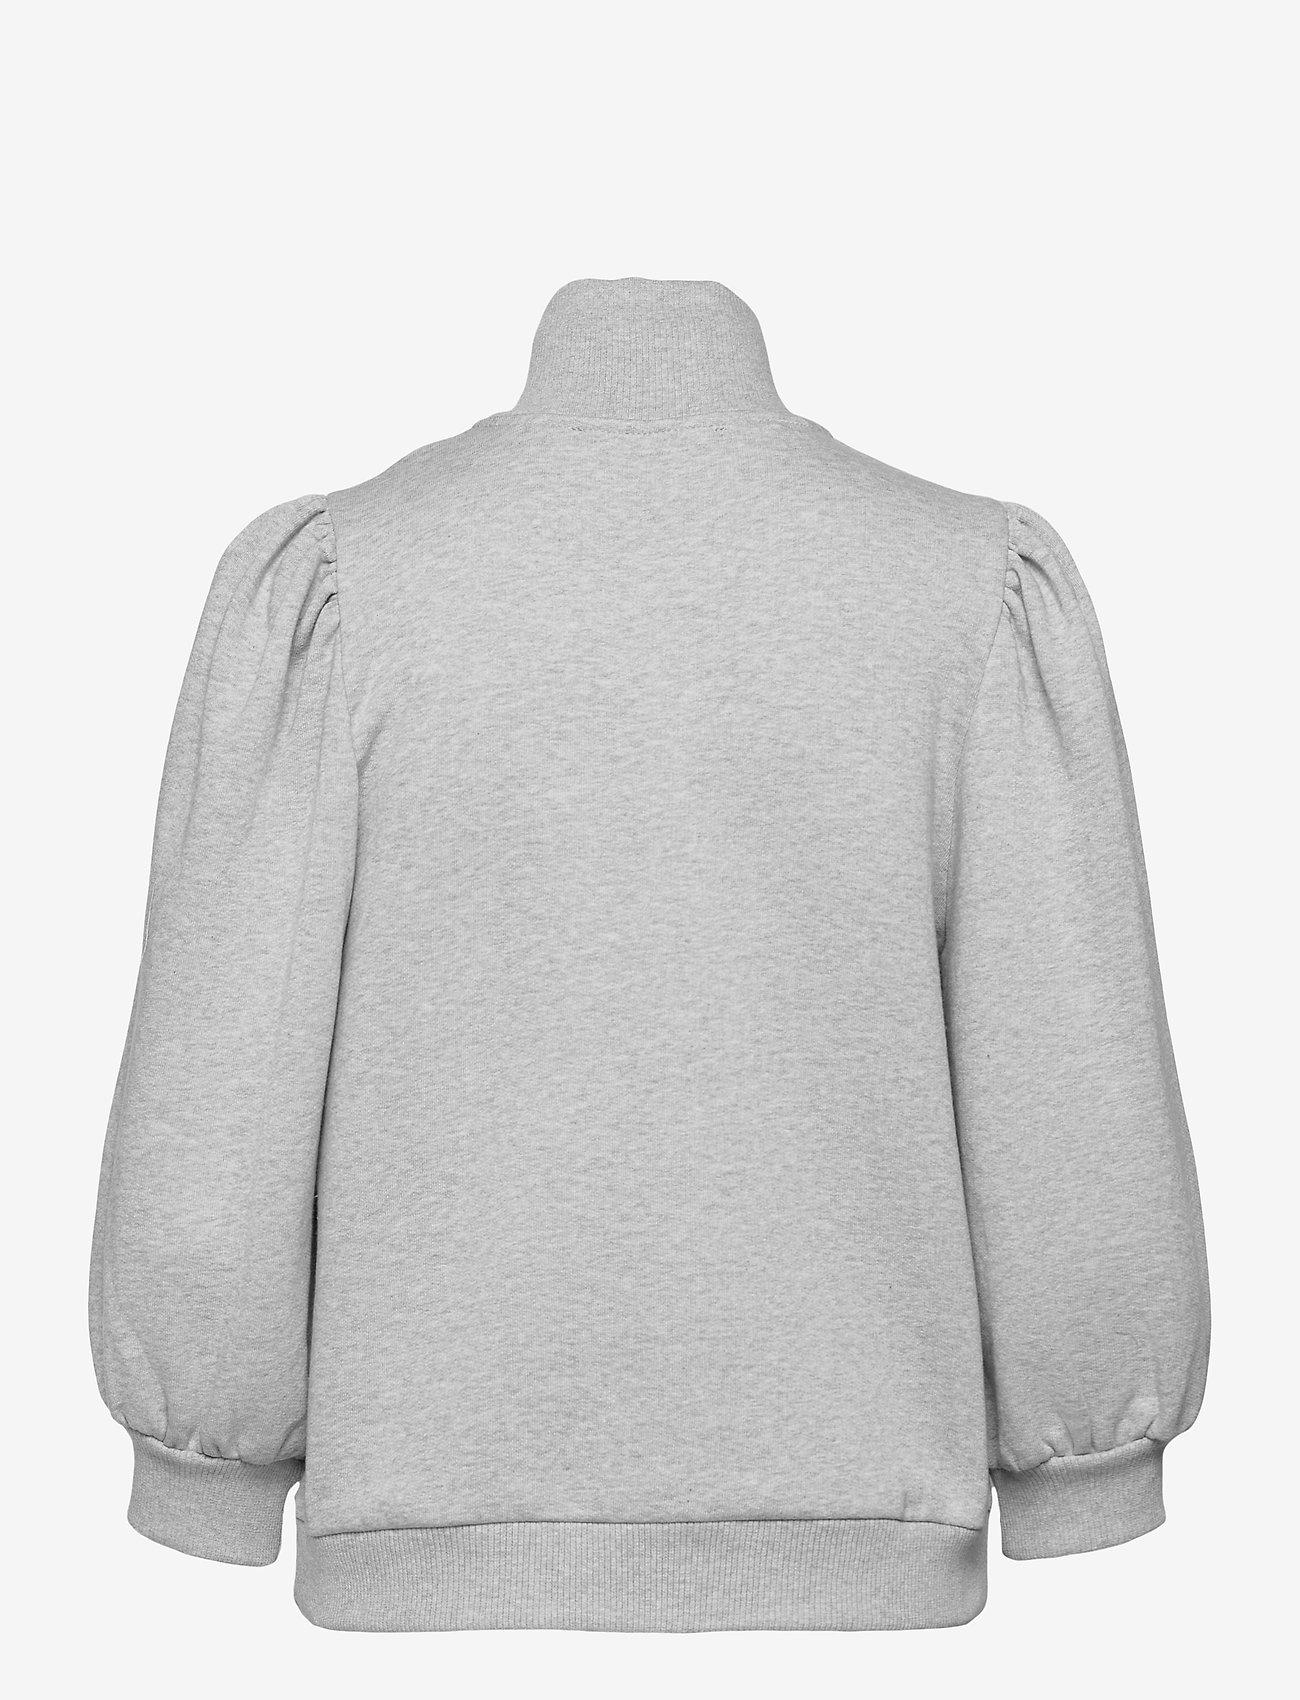 Gestuz - NankitaGZ ss zipper sweatshirt - sweatshirts & hoodies - light grey melange - 2